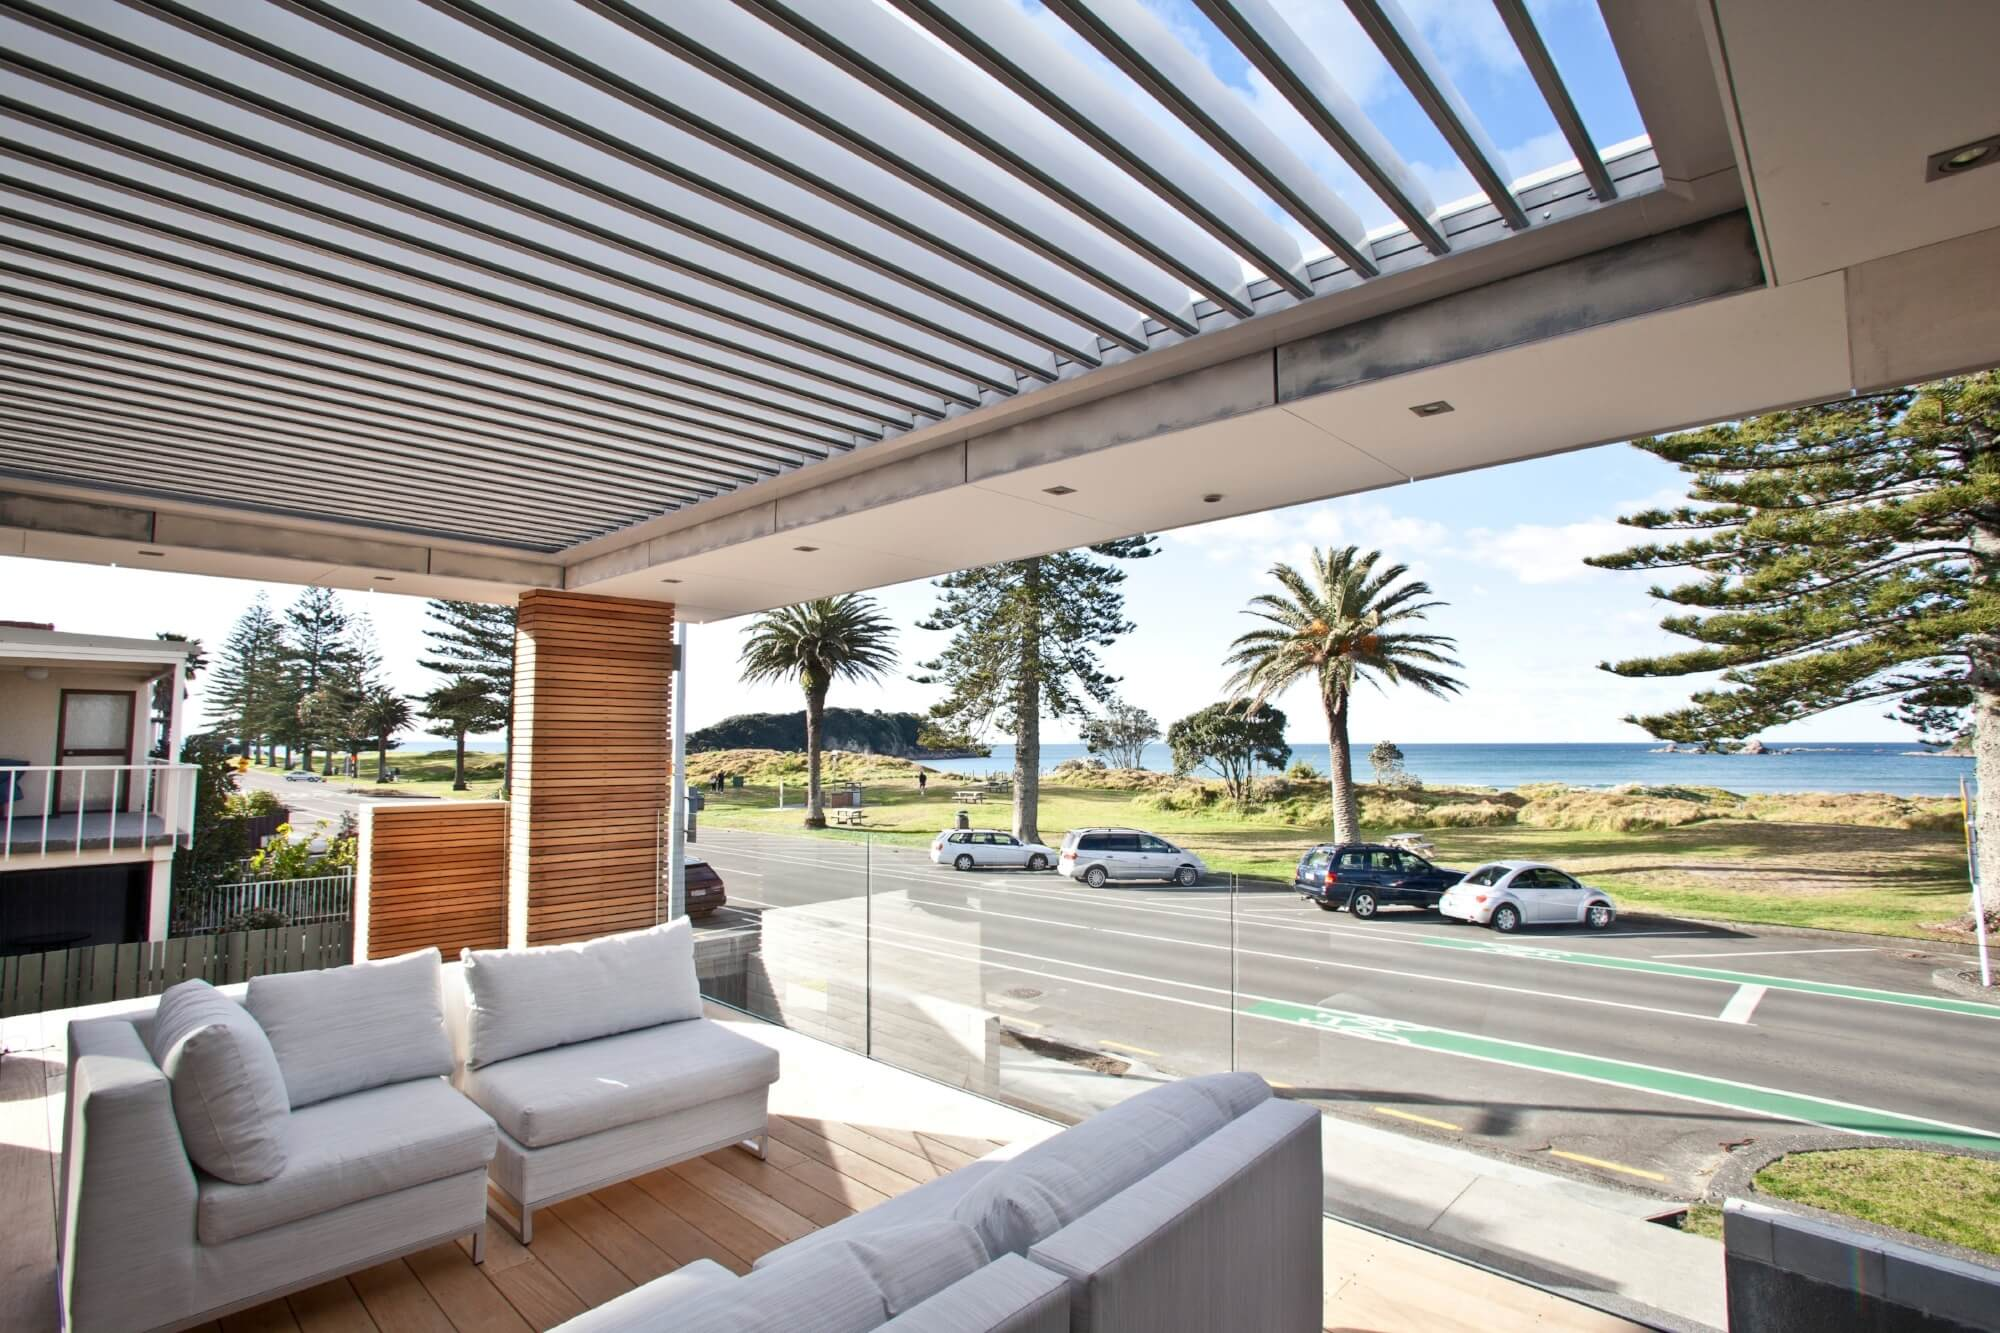 louvre pergola coastal NZ